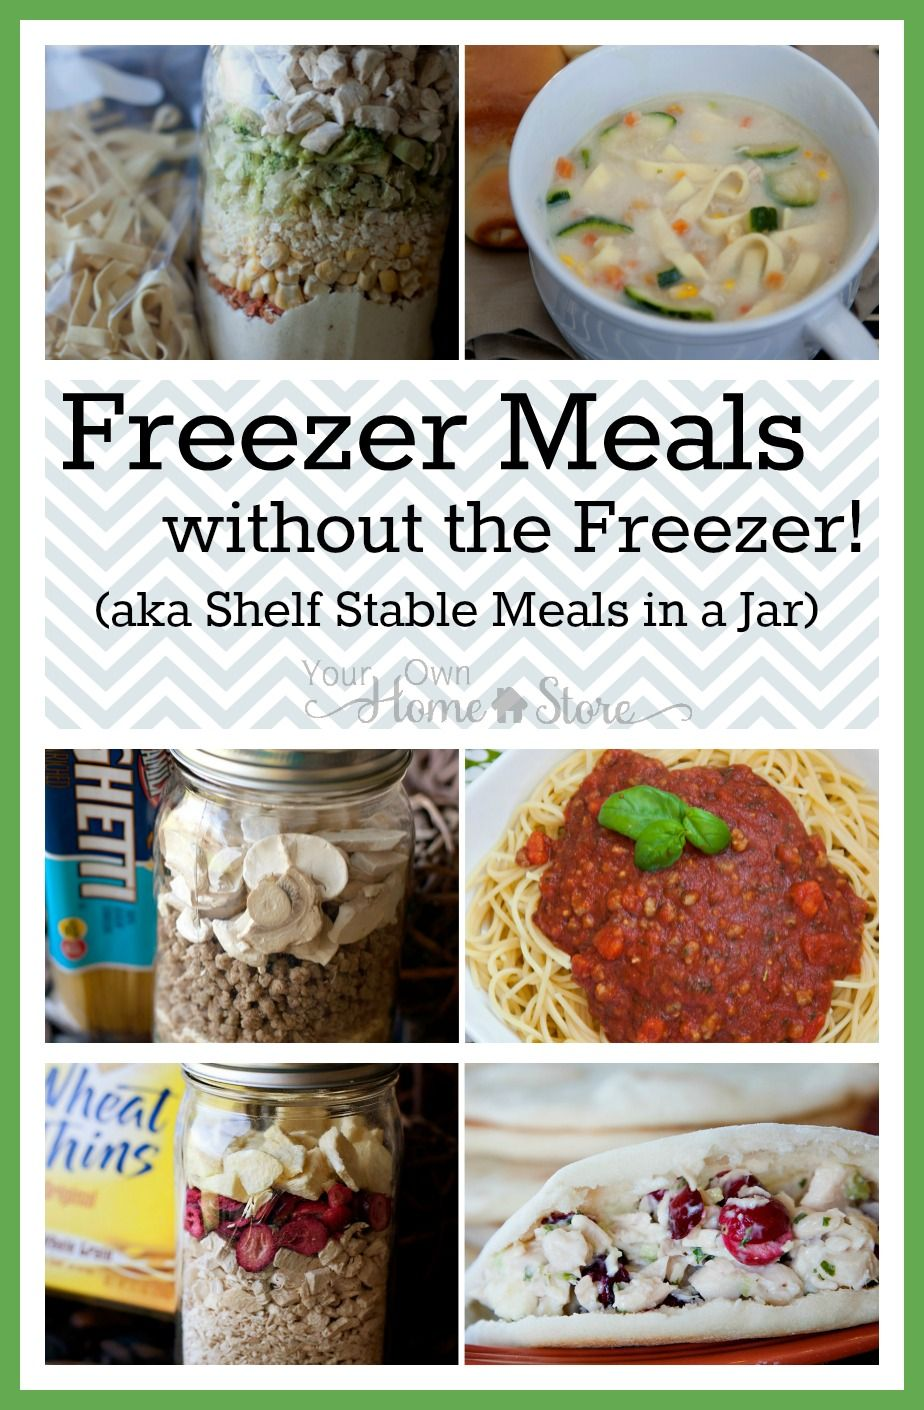 Freezer meals without the freezer shelf stable meals in a jar freezer meals without the freezer shelf stable meals in a jar forumfinder Choice Image